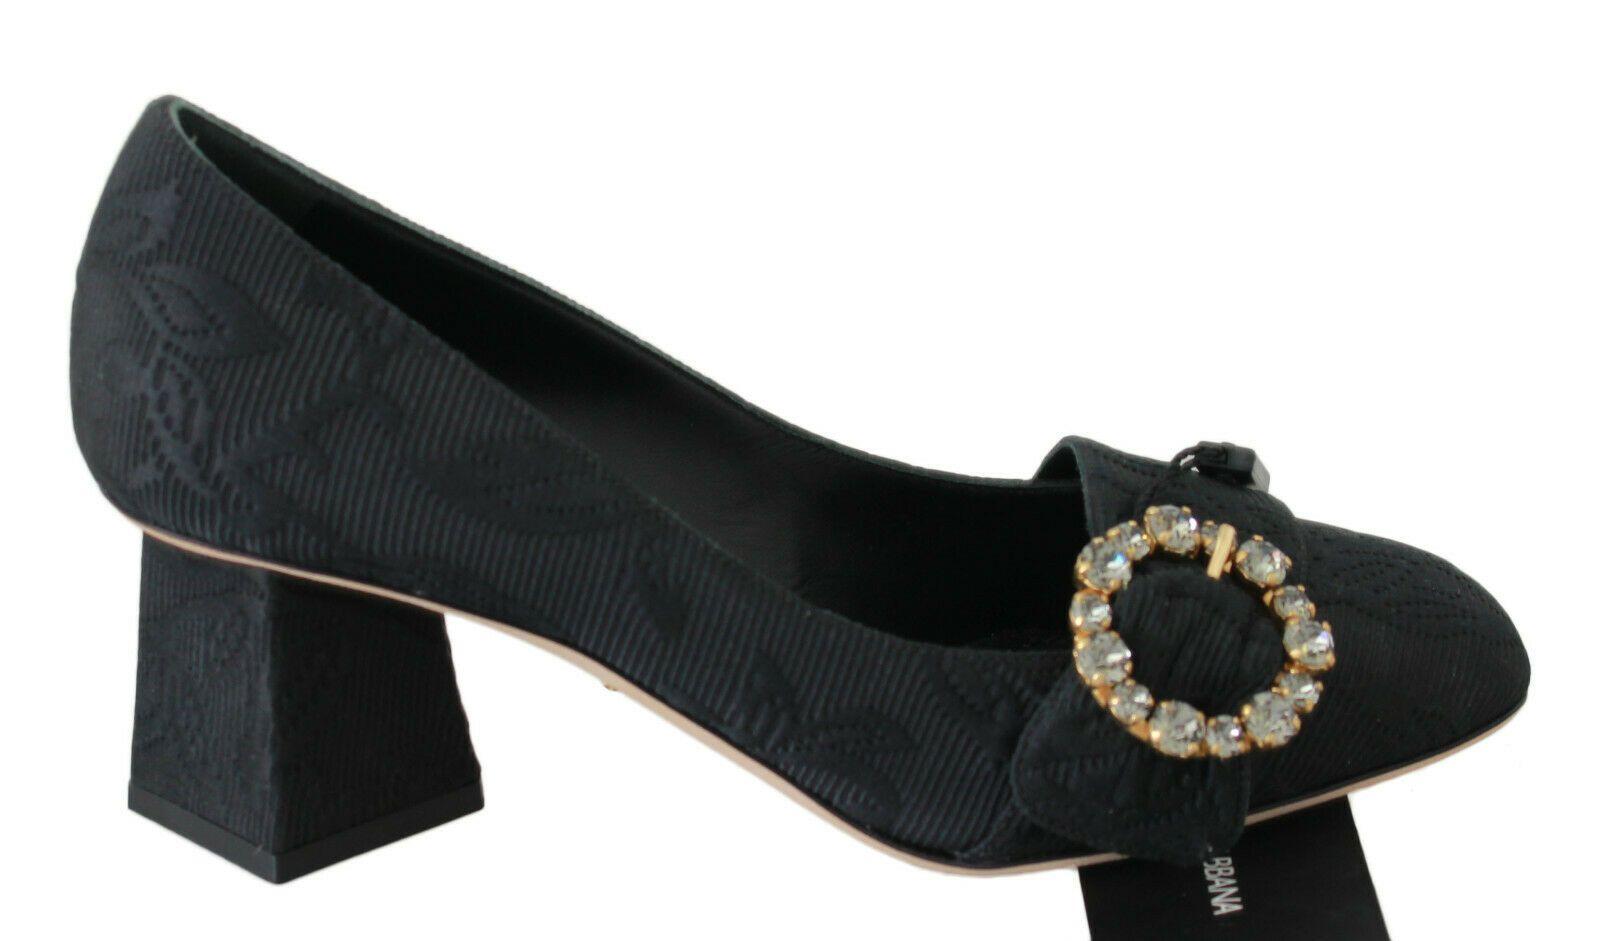 Dolce & Gabbana Women's Jacquard Crystal Pumps Black LA6173 - EU36.5/US6